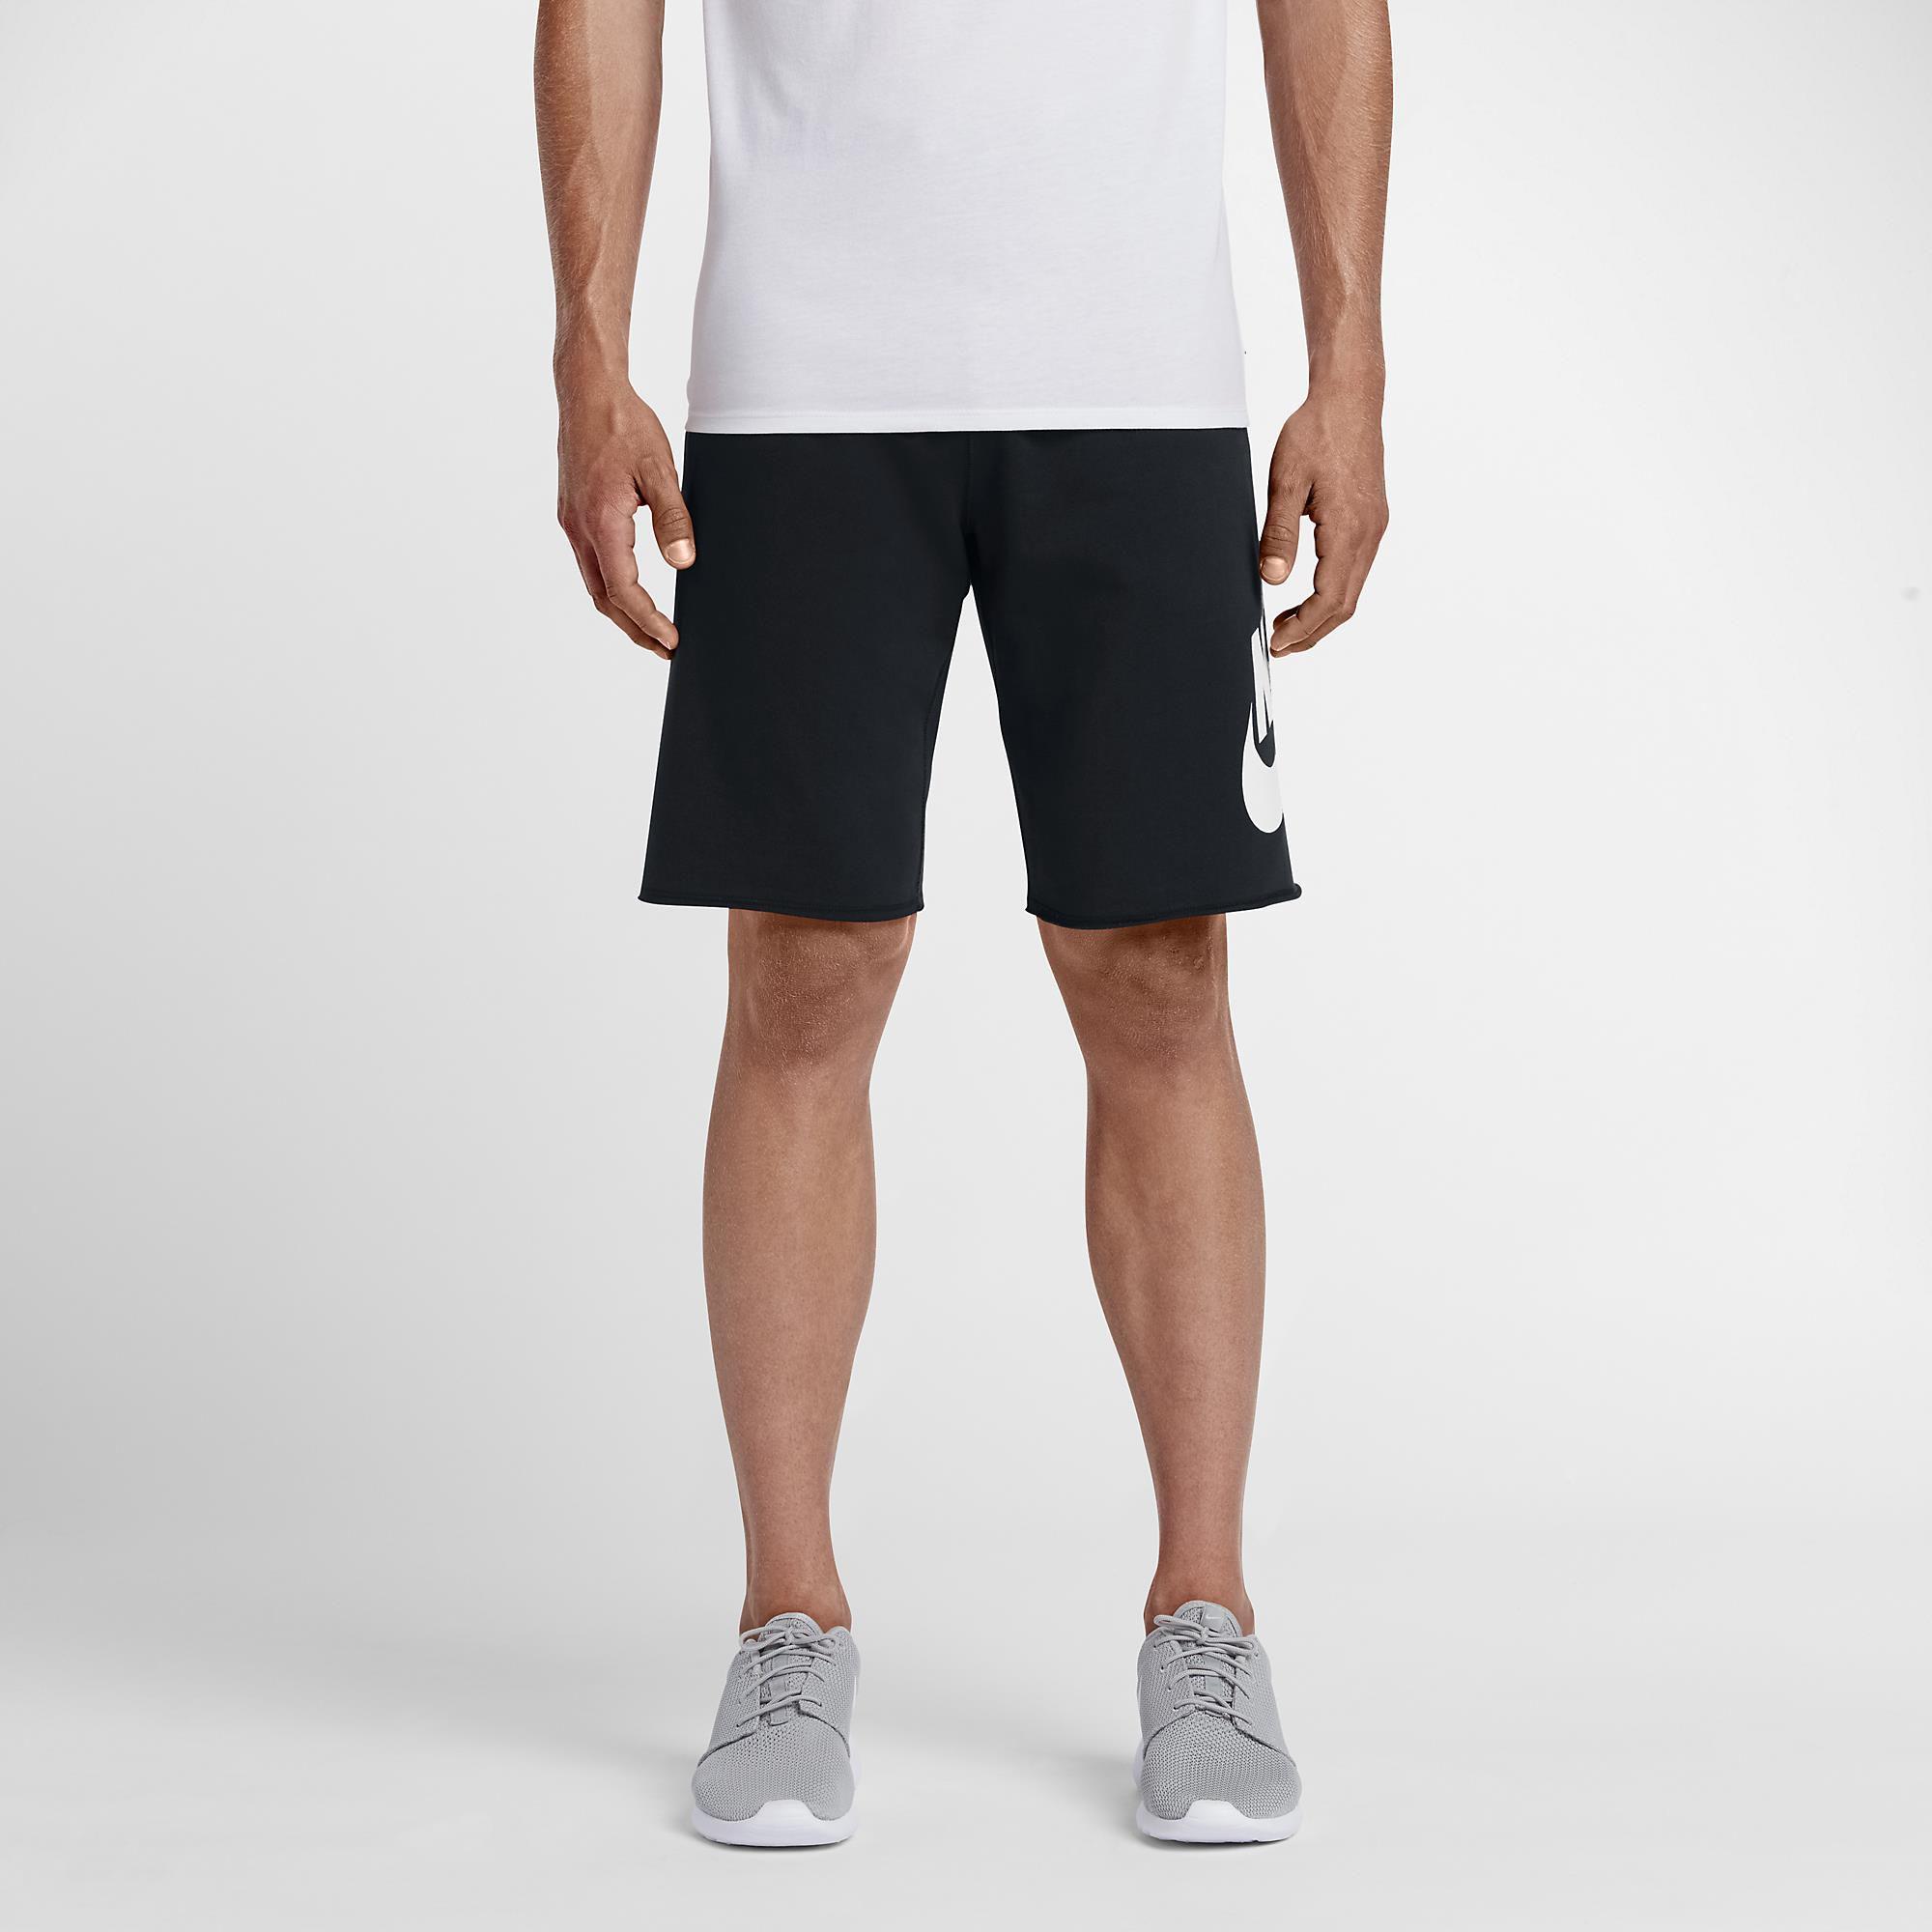 Bermuda Masculina Nike Nsw Short Ft Gx